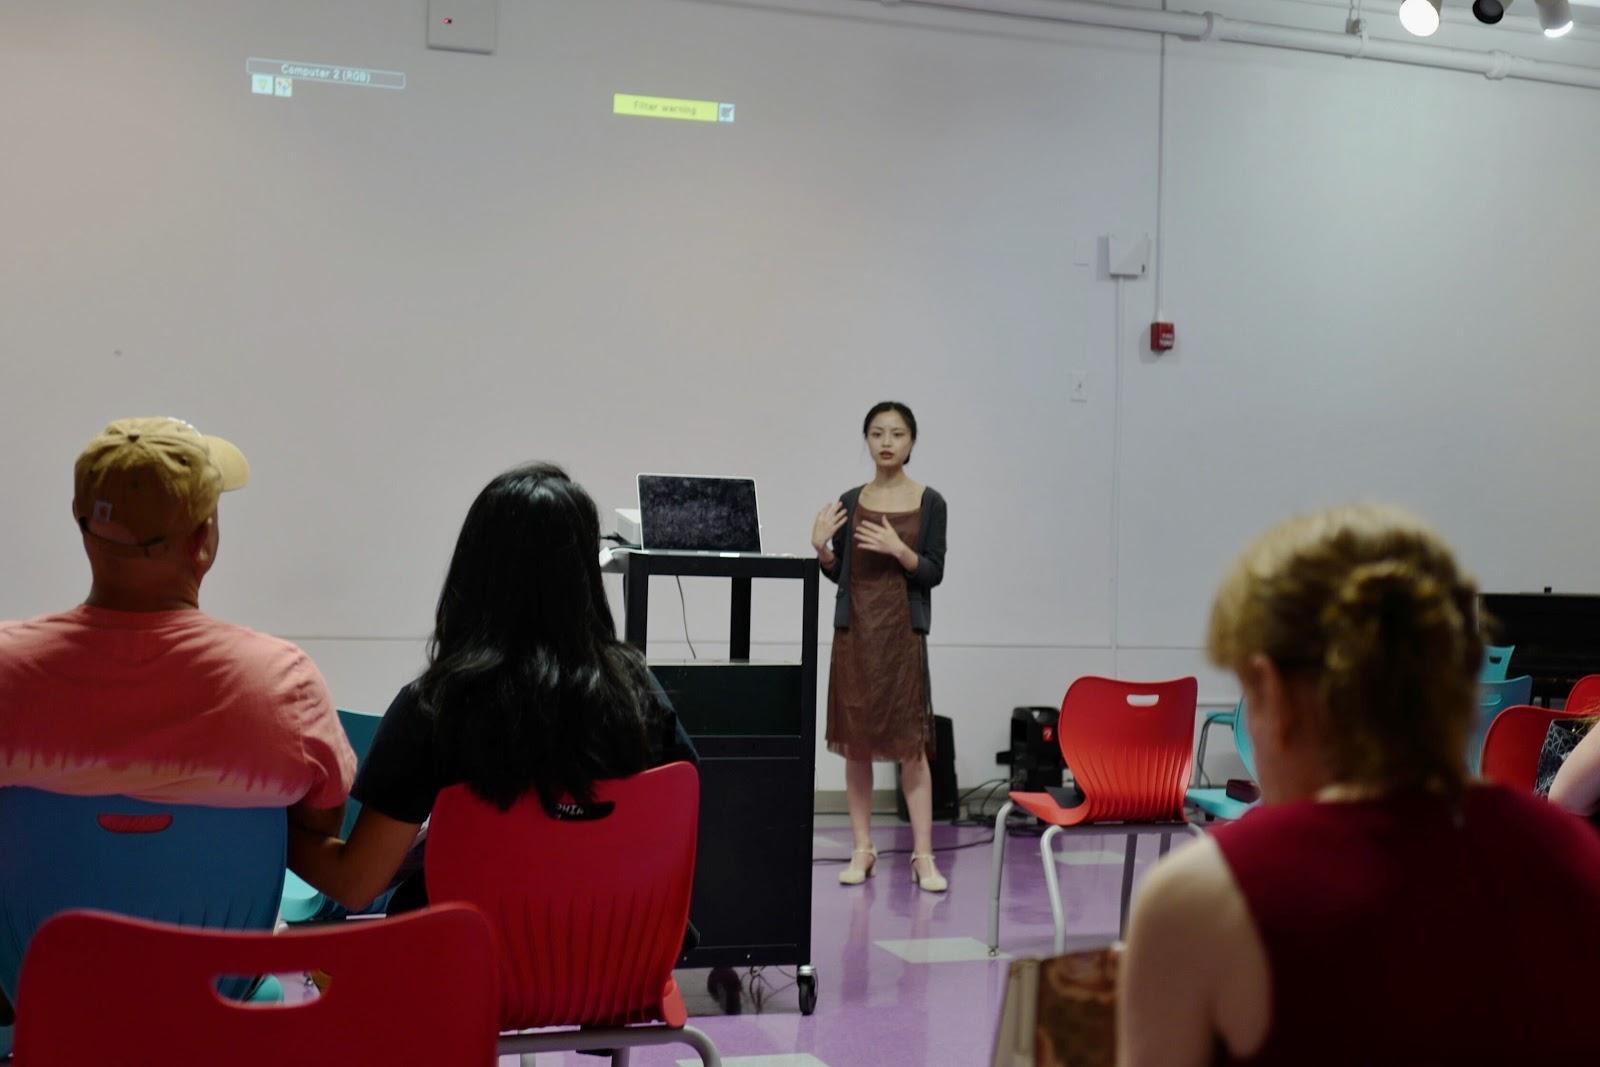 Curatorial Director Irina Li introducing the documentary and the street artists.